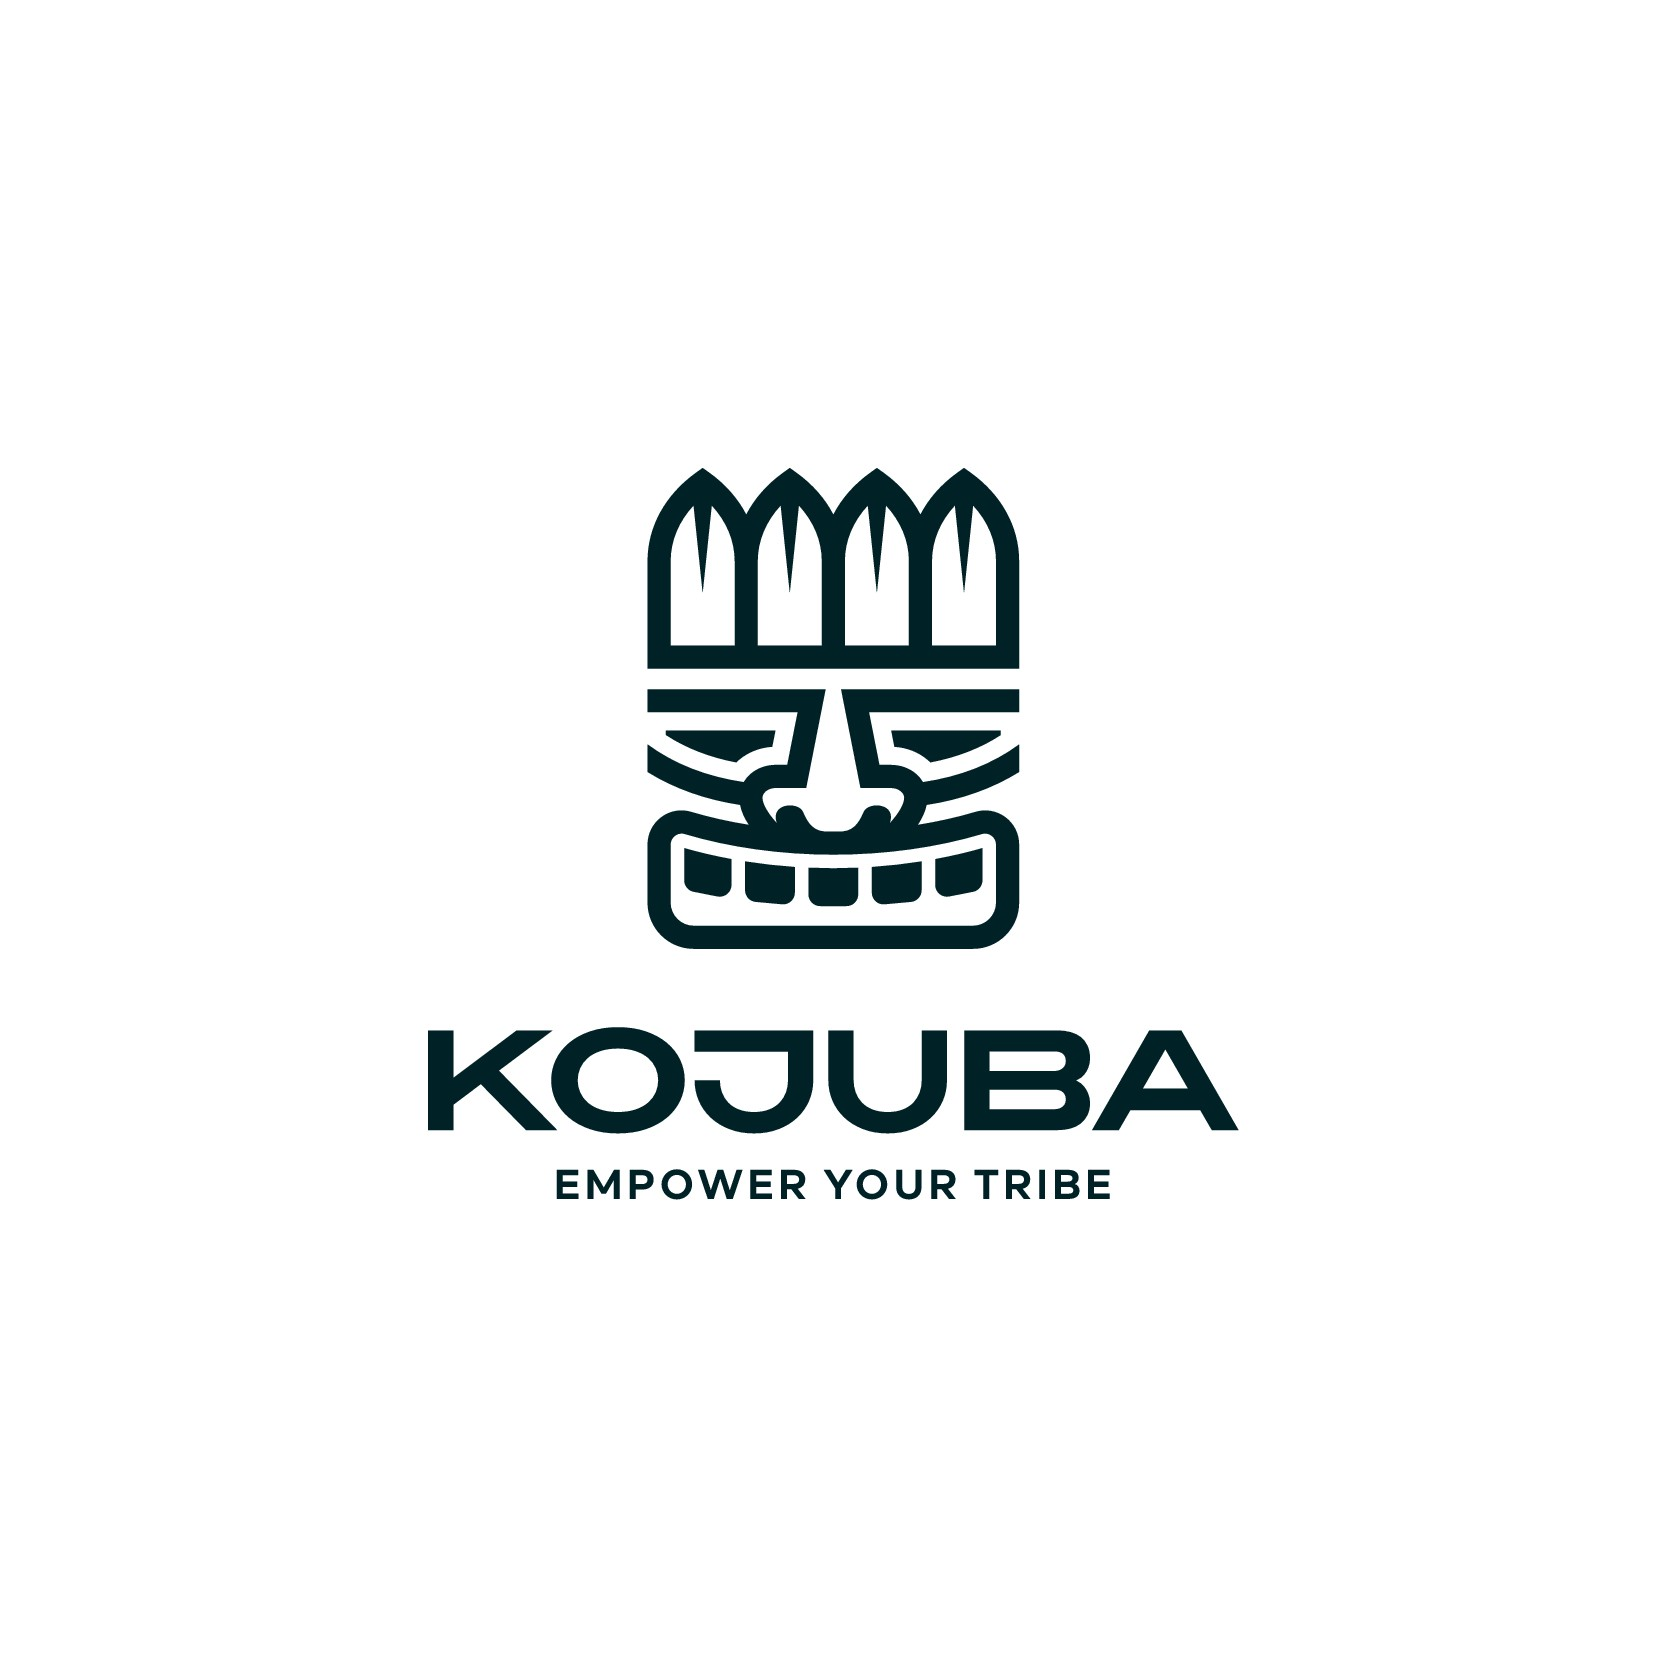 Kojuba is a Tribe - Help us design the logo for it! - (HR Analytics Company)